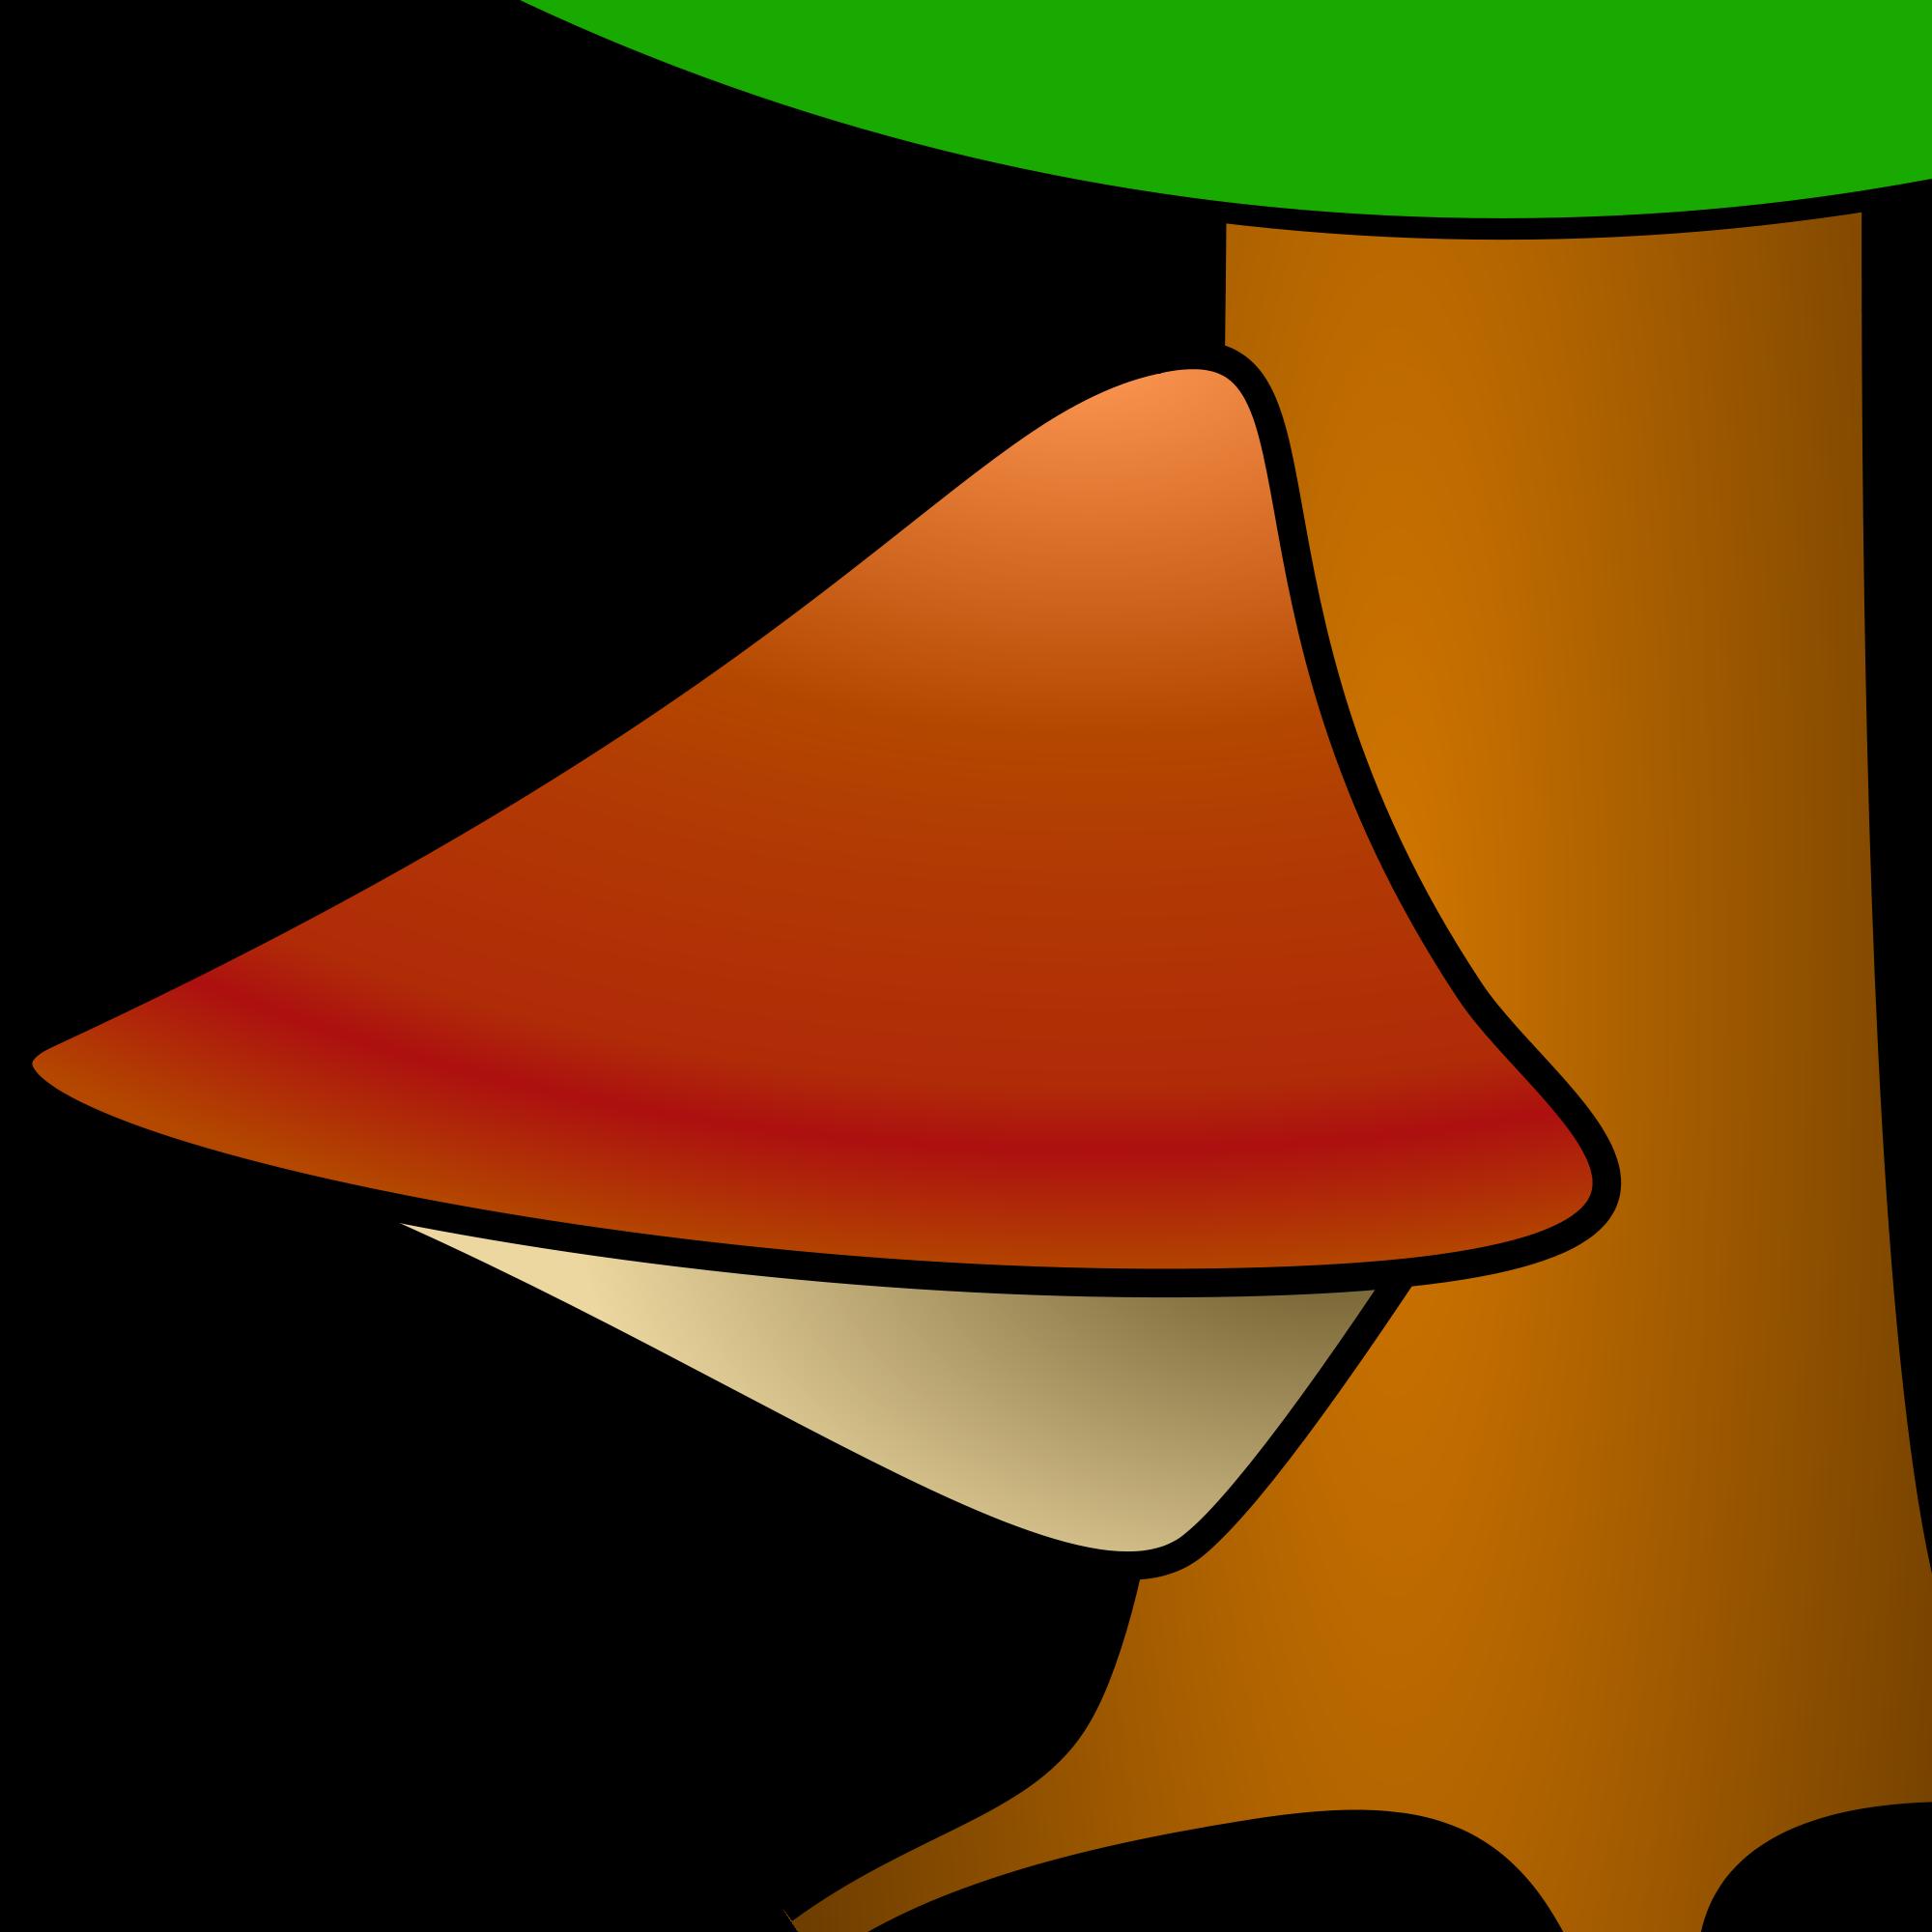 File:Parasitic fungus.svg.